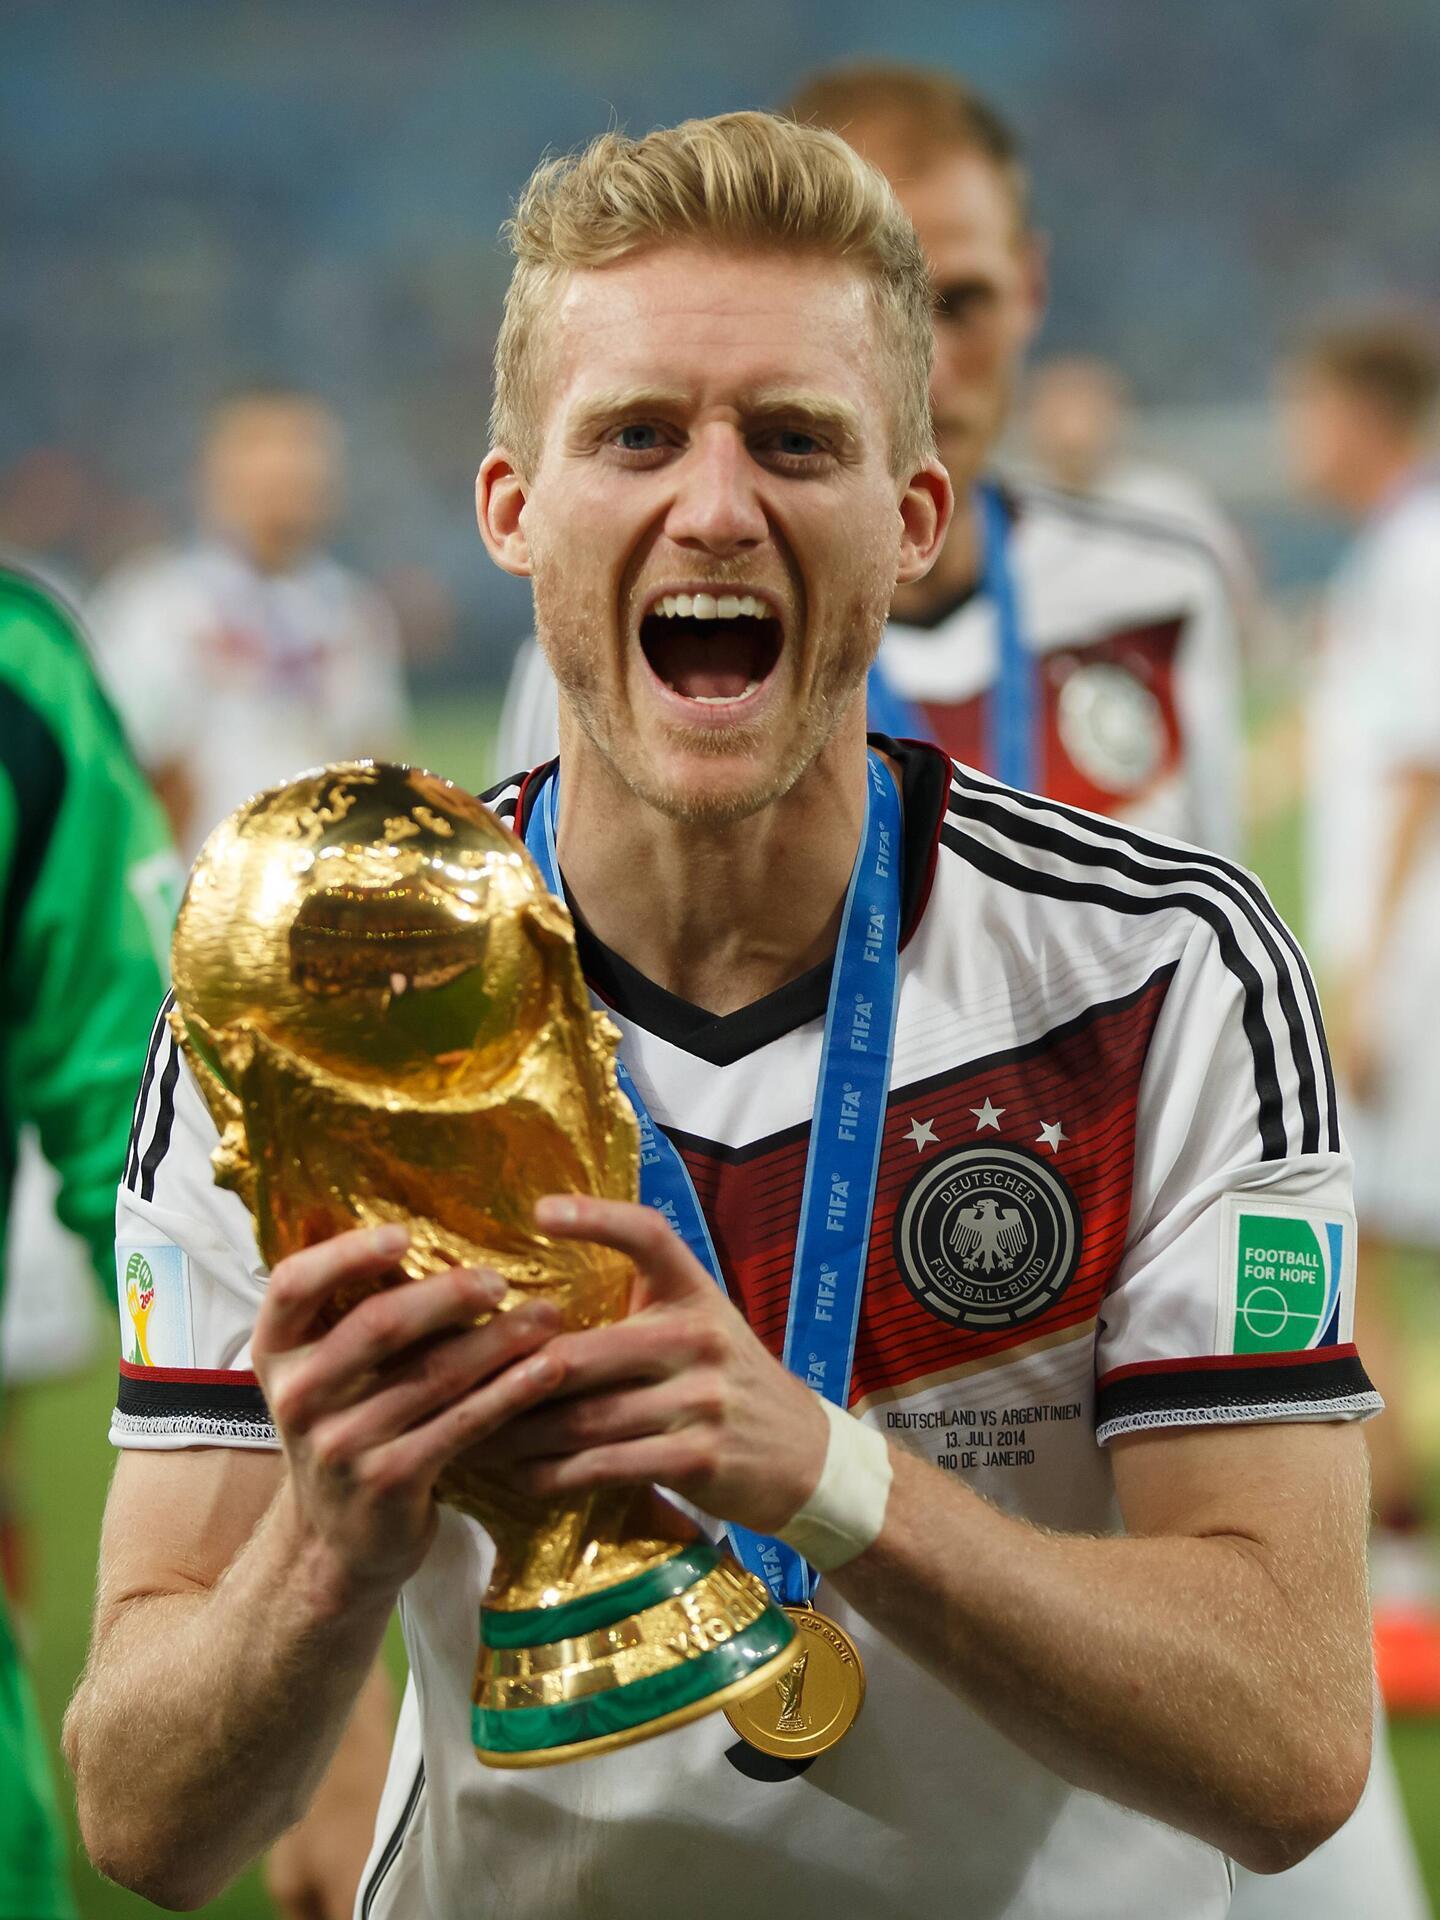 Bild zu André Schürrle, WM Finale, Weltmeister, Pokal